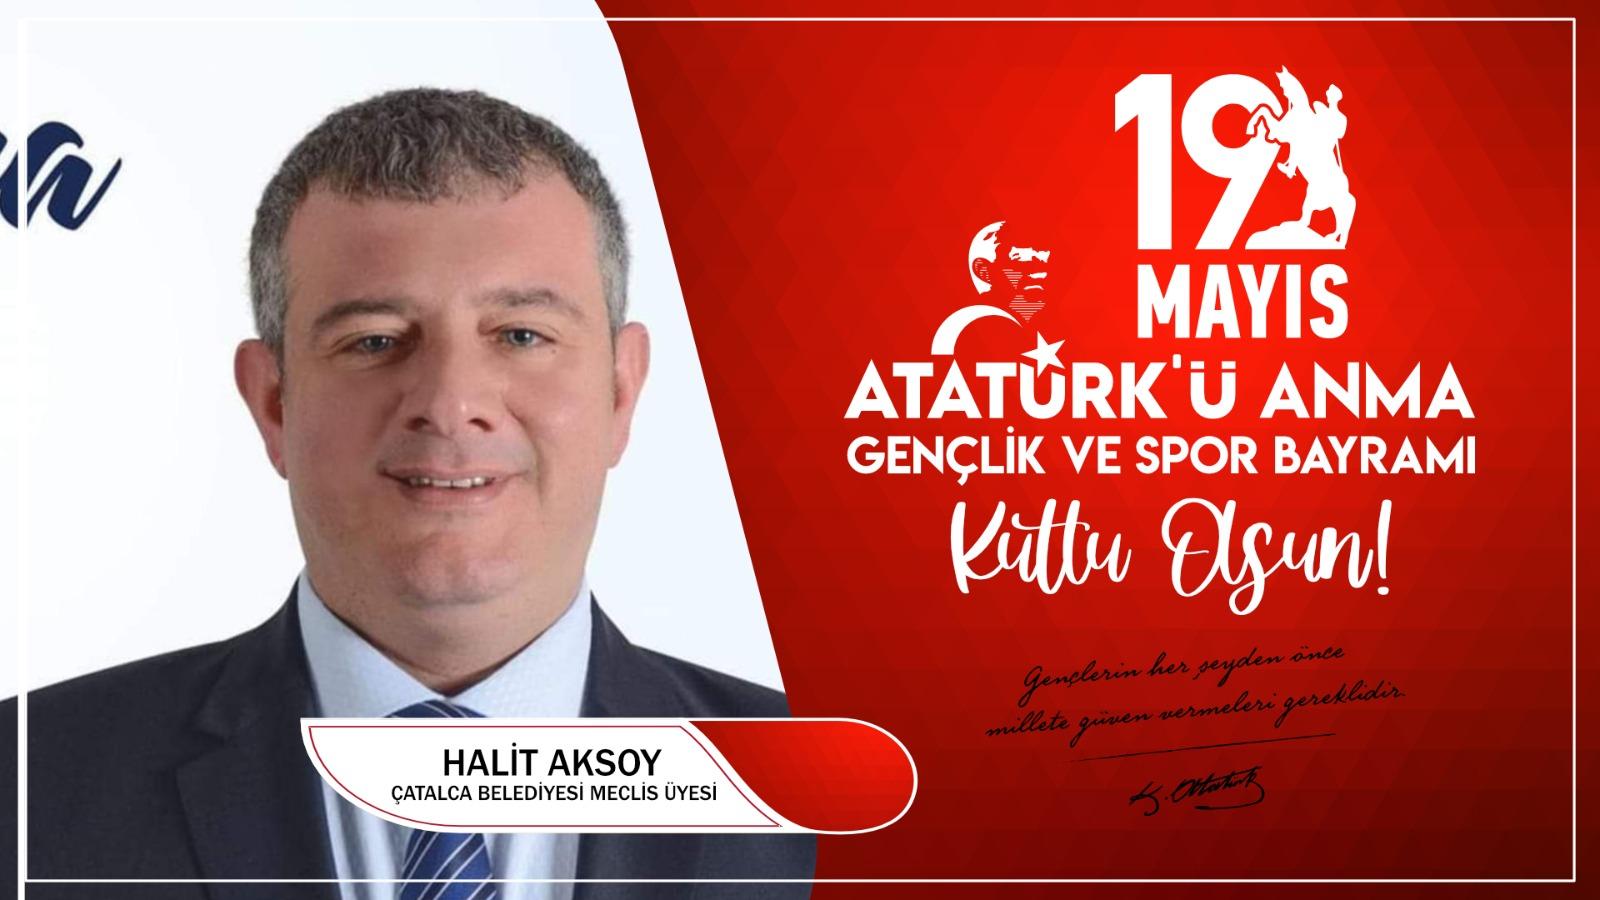 Halit Aksoy'dan Kutlama Mesajı